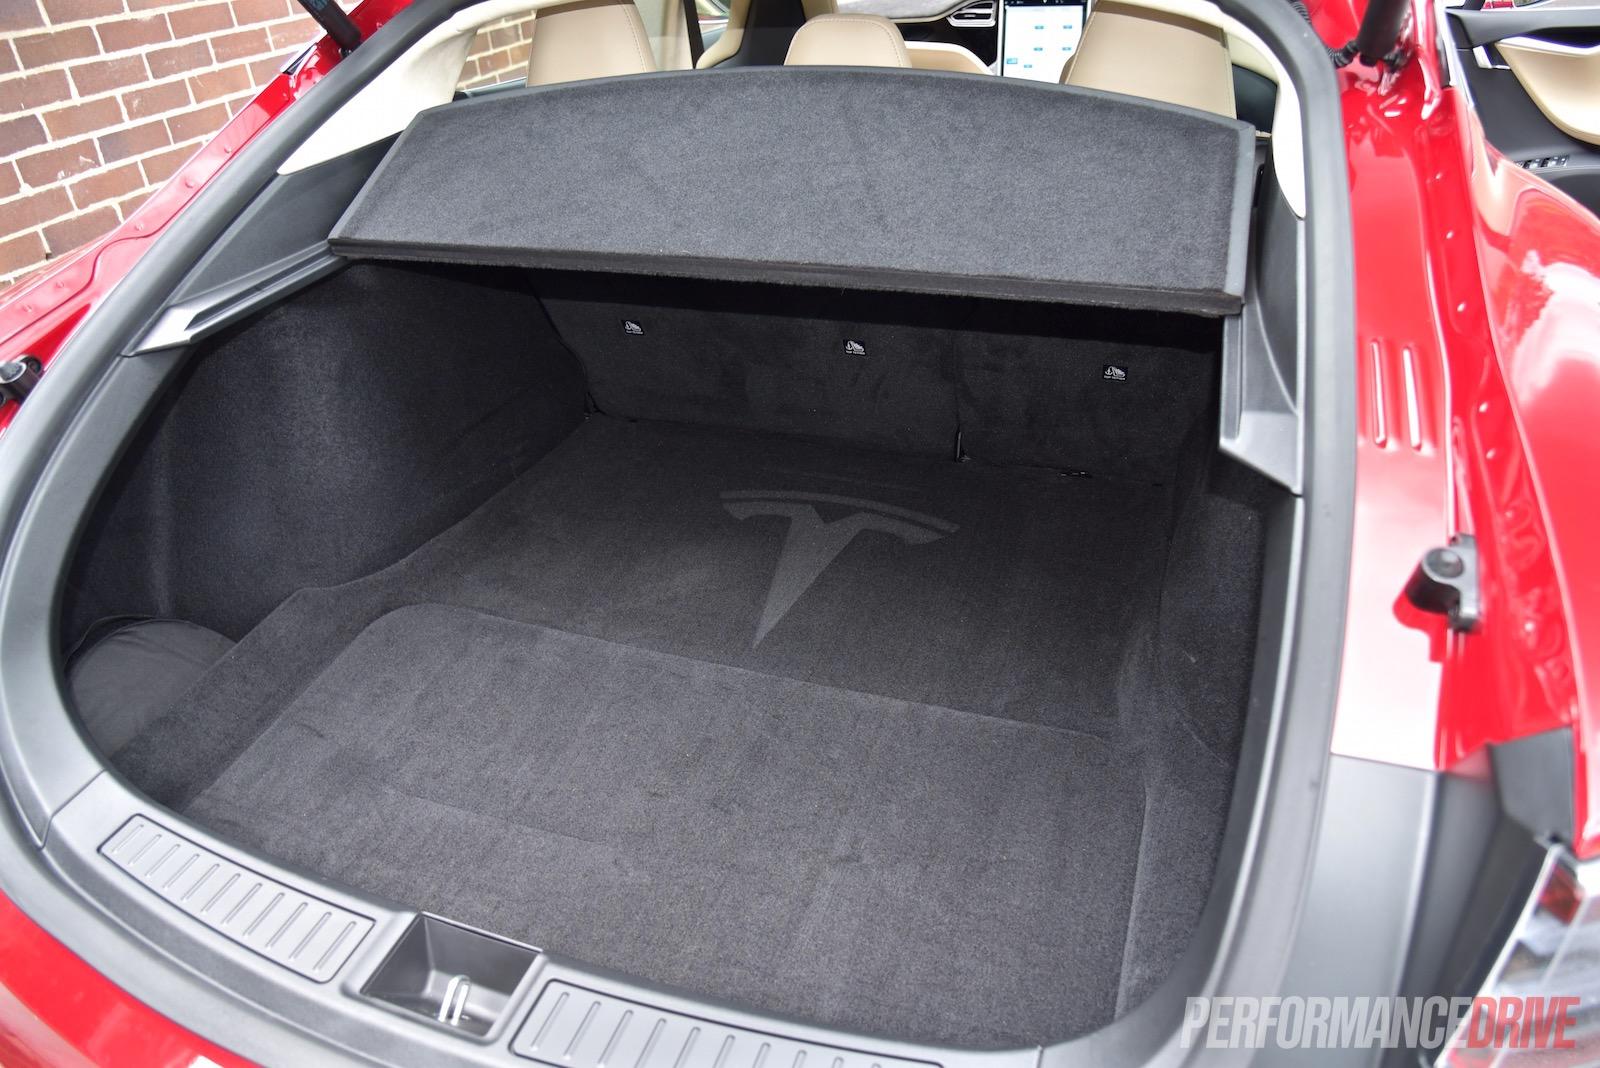 2015 Tesla Model S P90D review (video) | PerformanceDrive